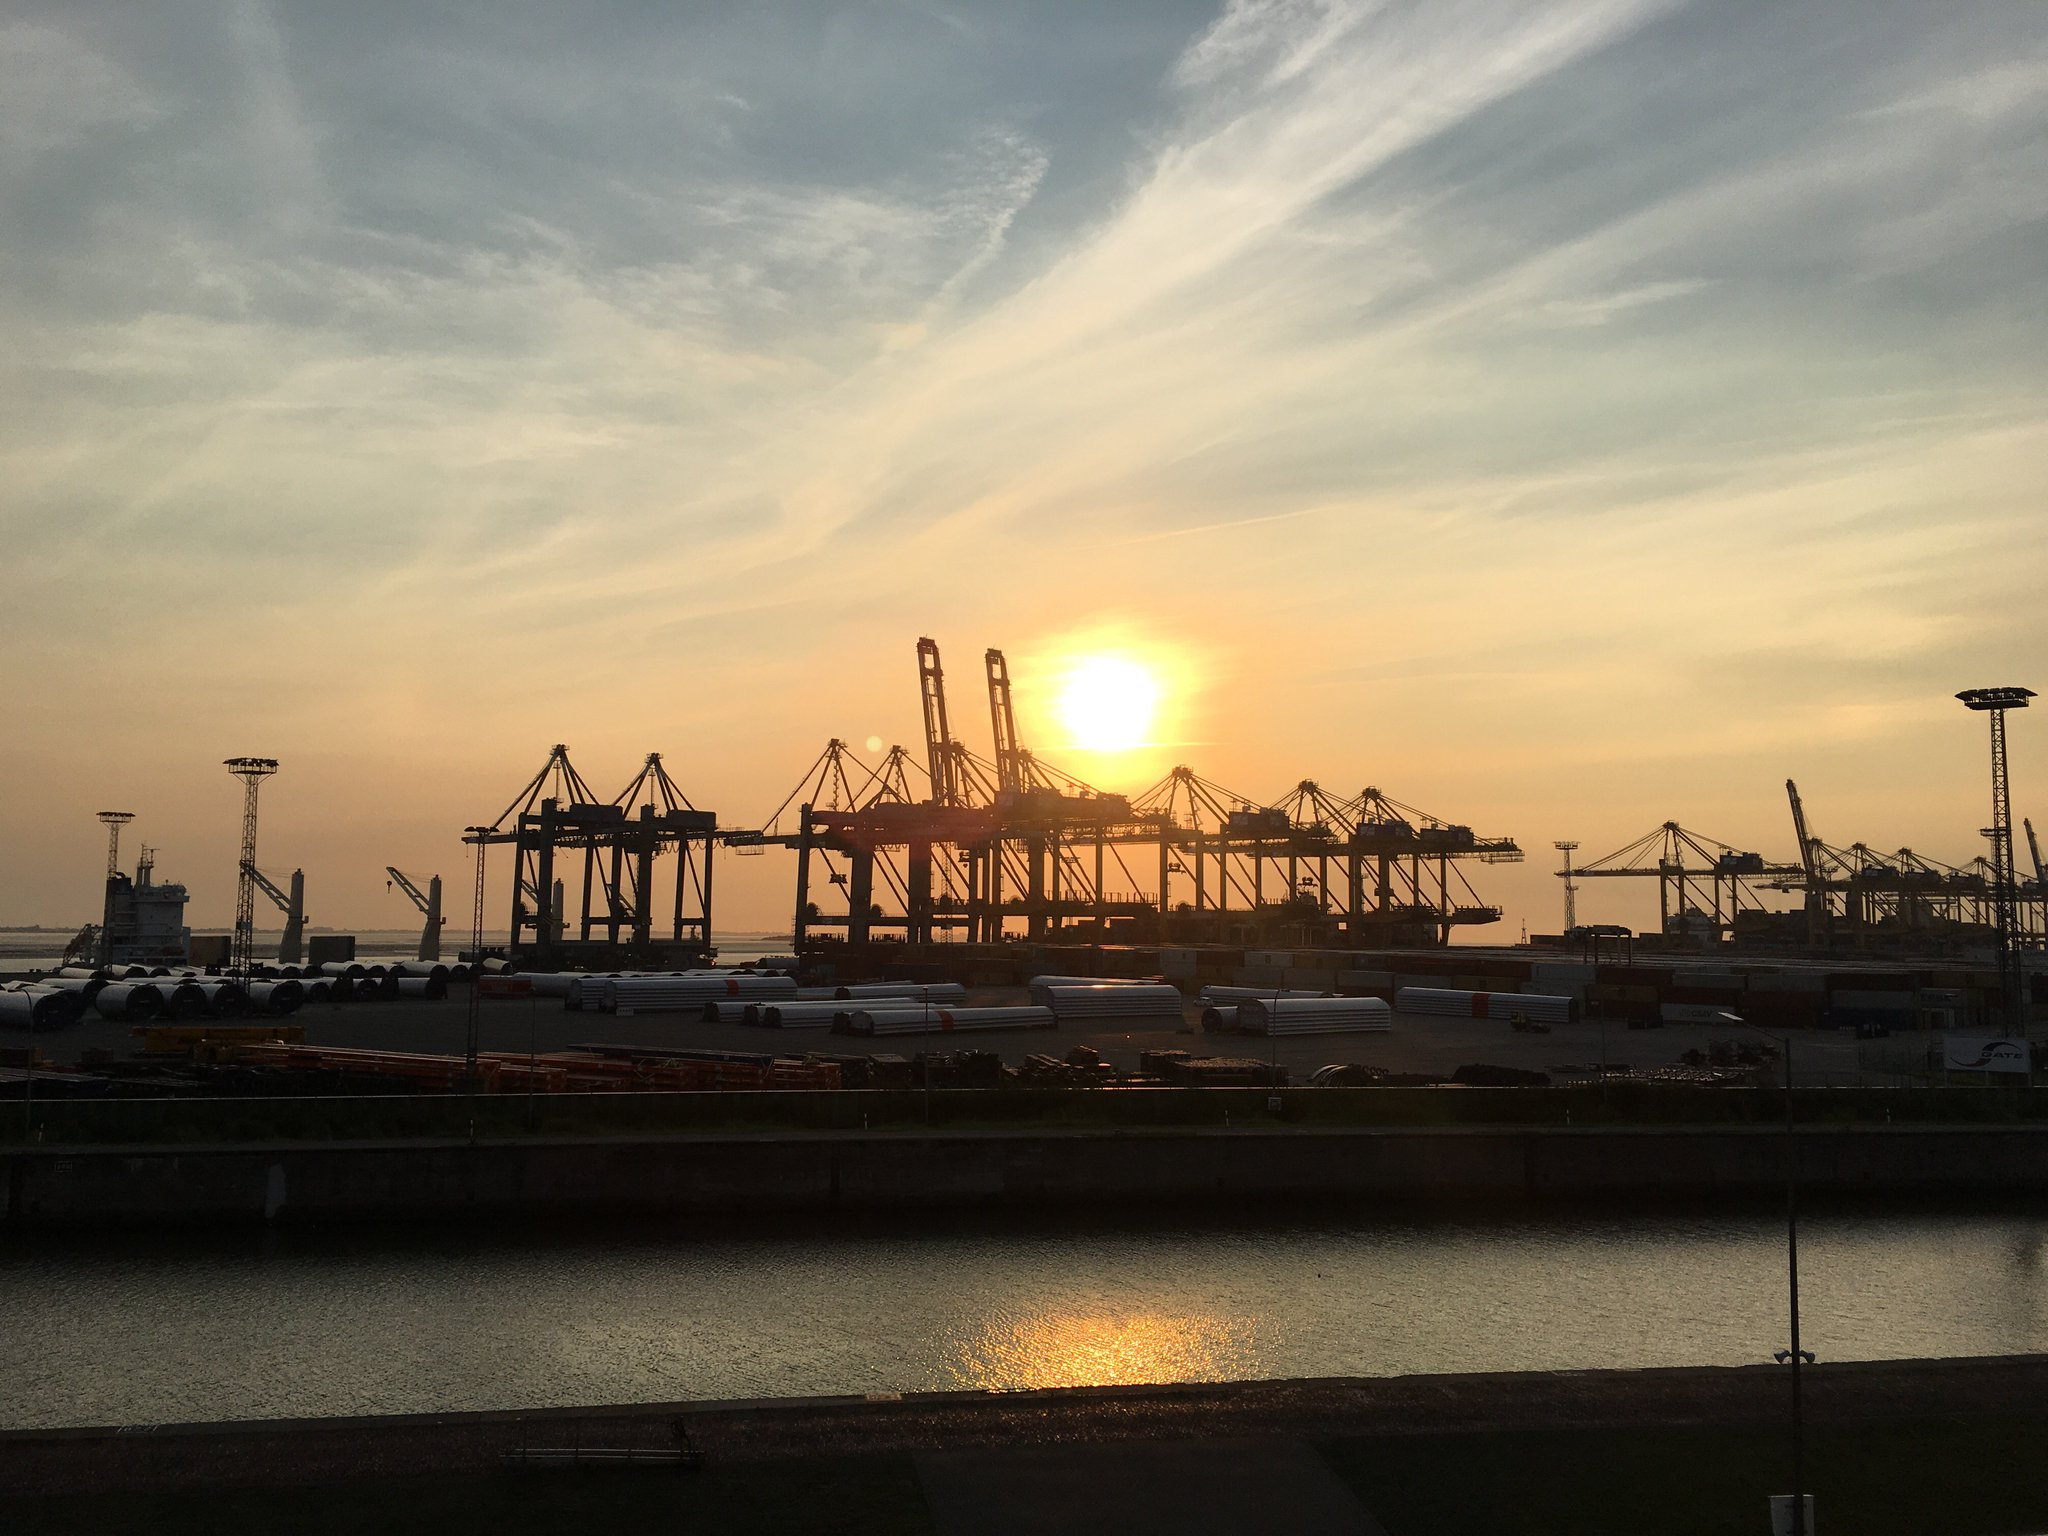 Thumbnail for Bremerhaven